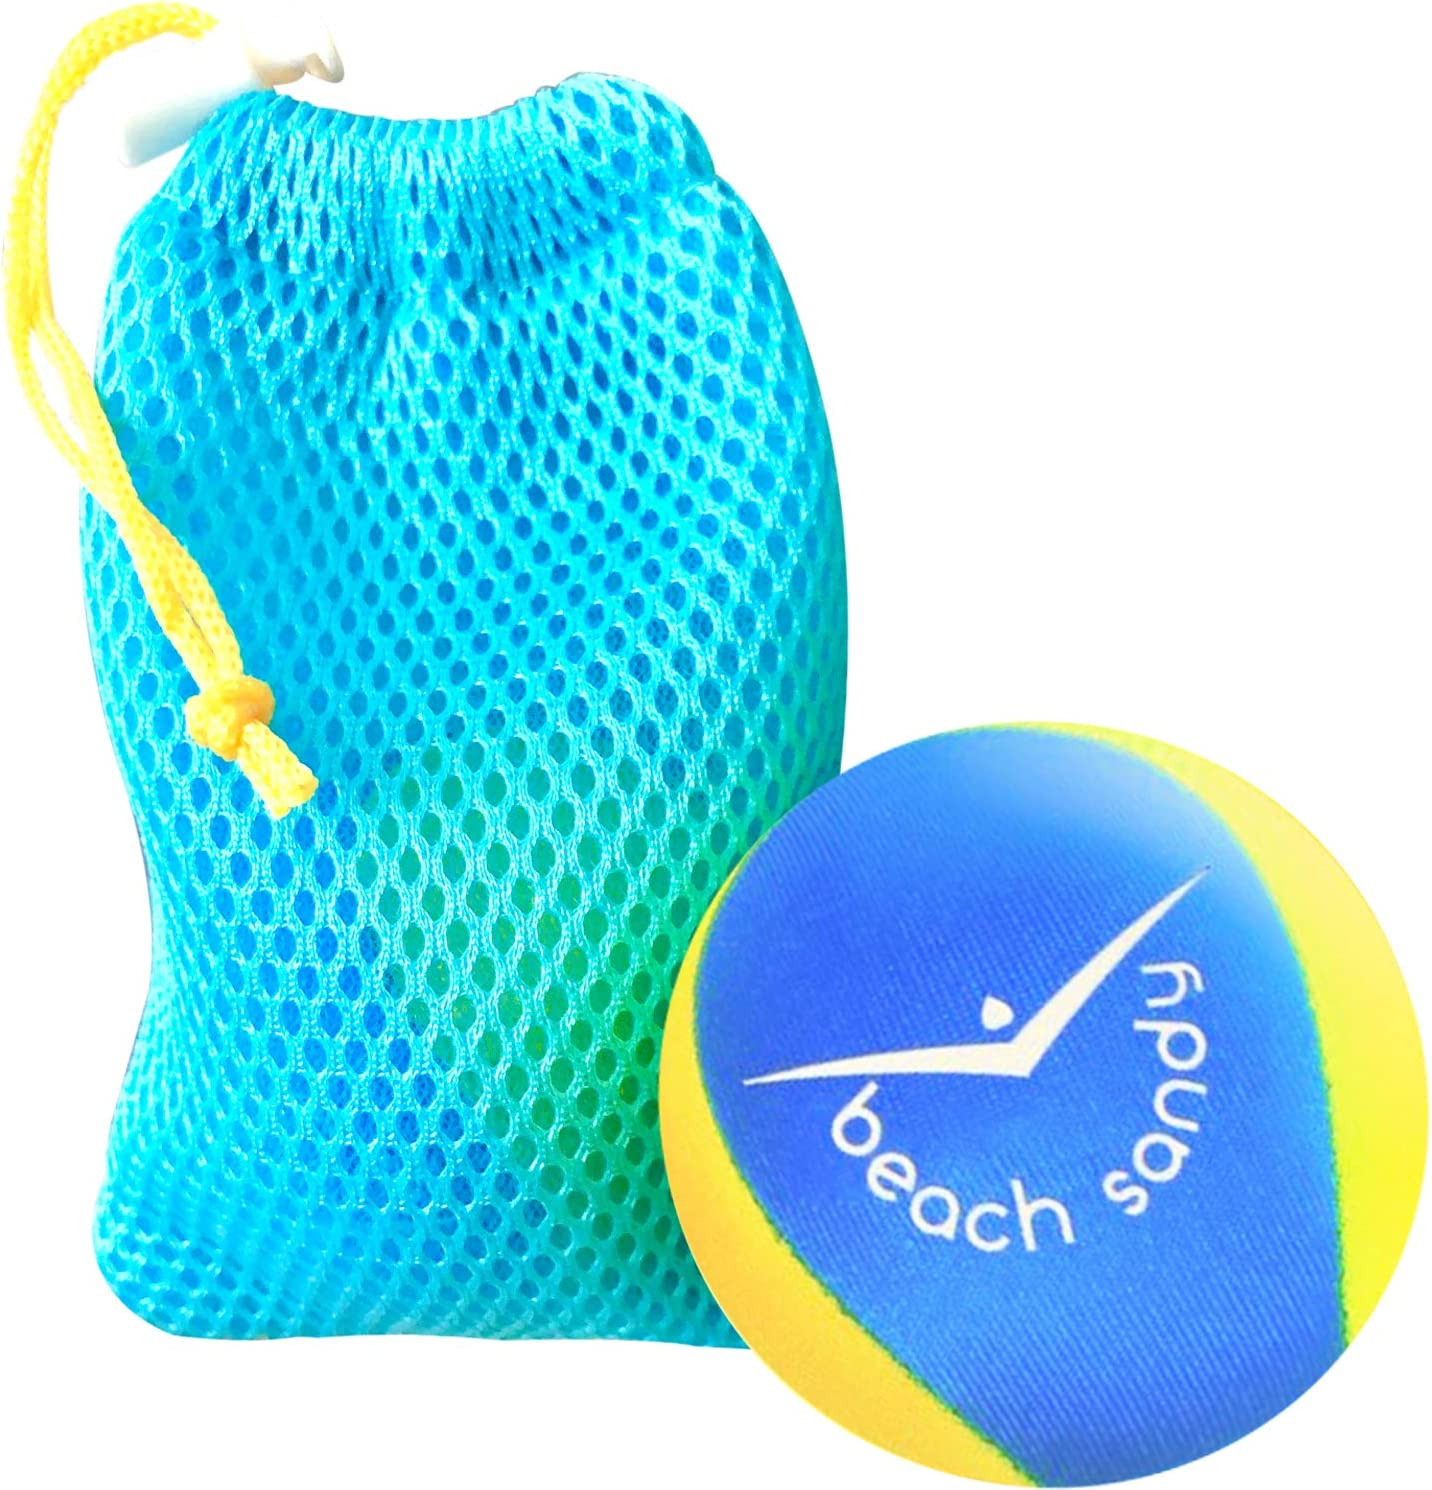 Beach Sandy Water Skip price Ball wholesale Bouncer